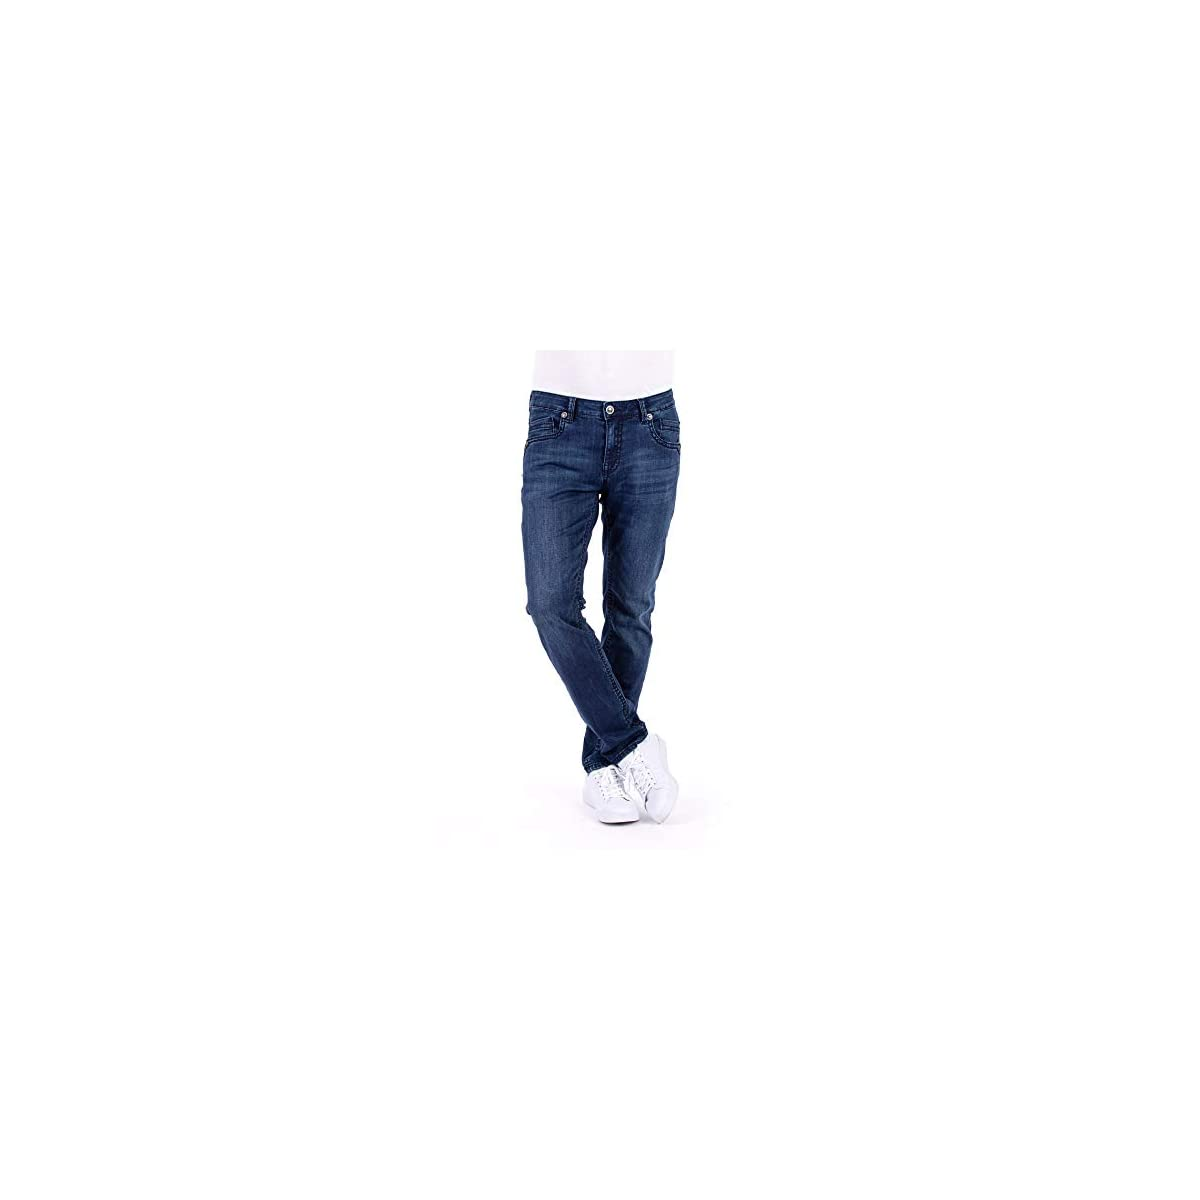 Blue Monkey Jeans Herren Freddy Contrast Stitching